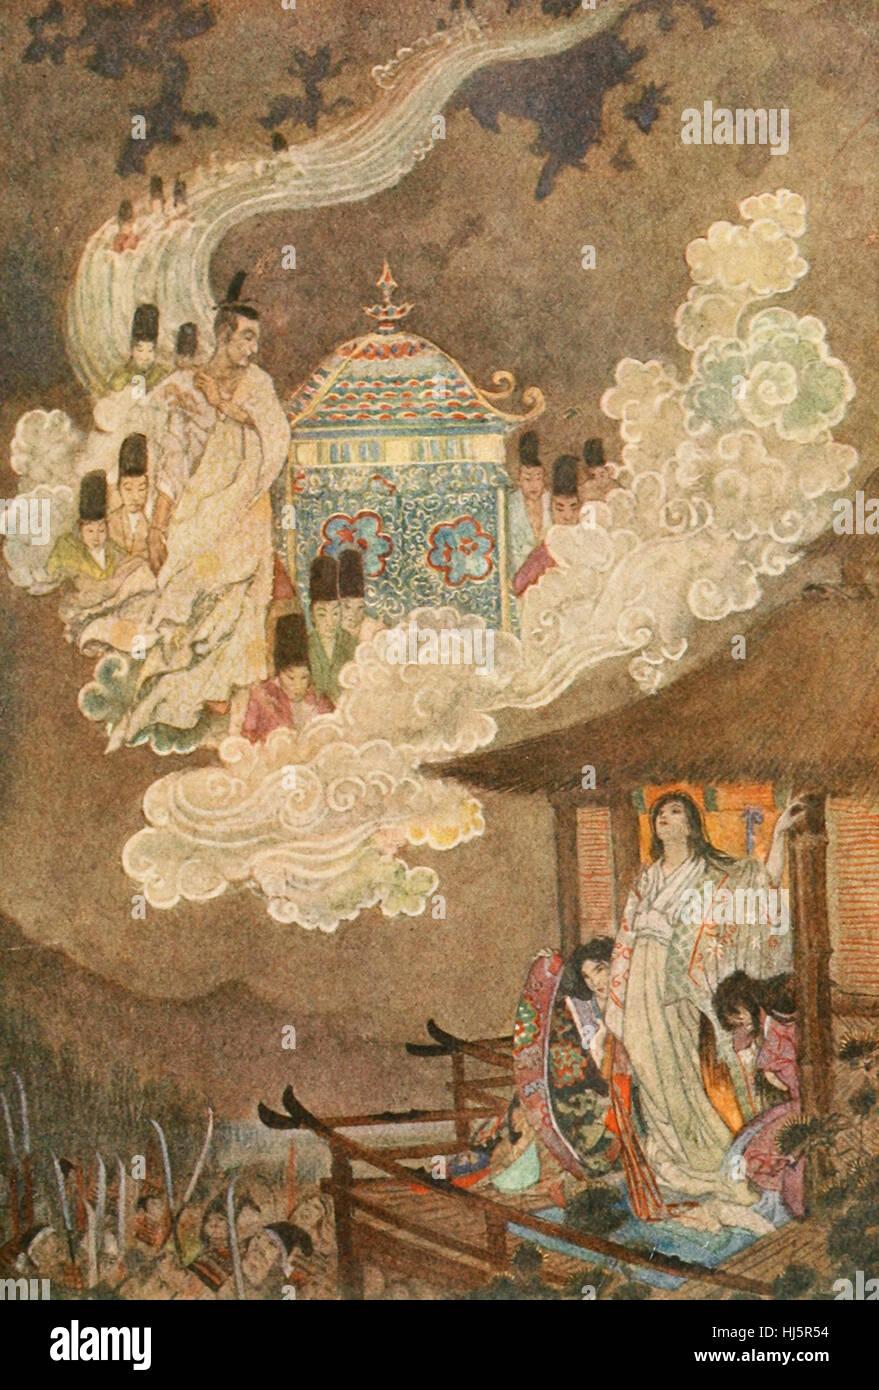 La domanda Moonfolk la signora Kaguya. Folklore giapponese Immagini Stock